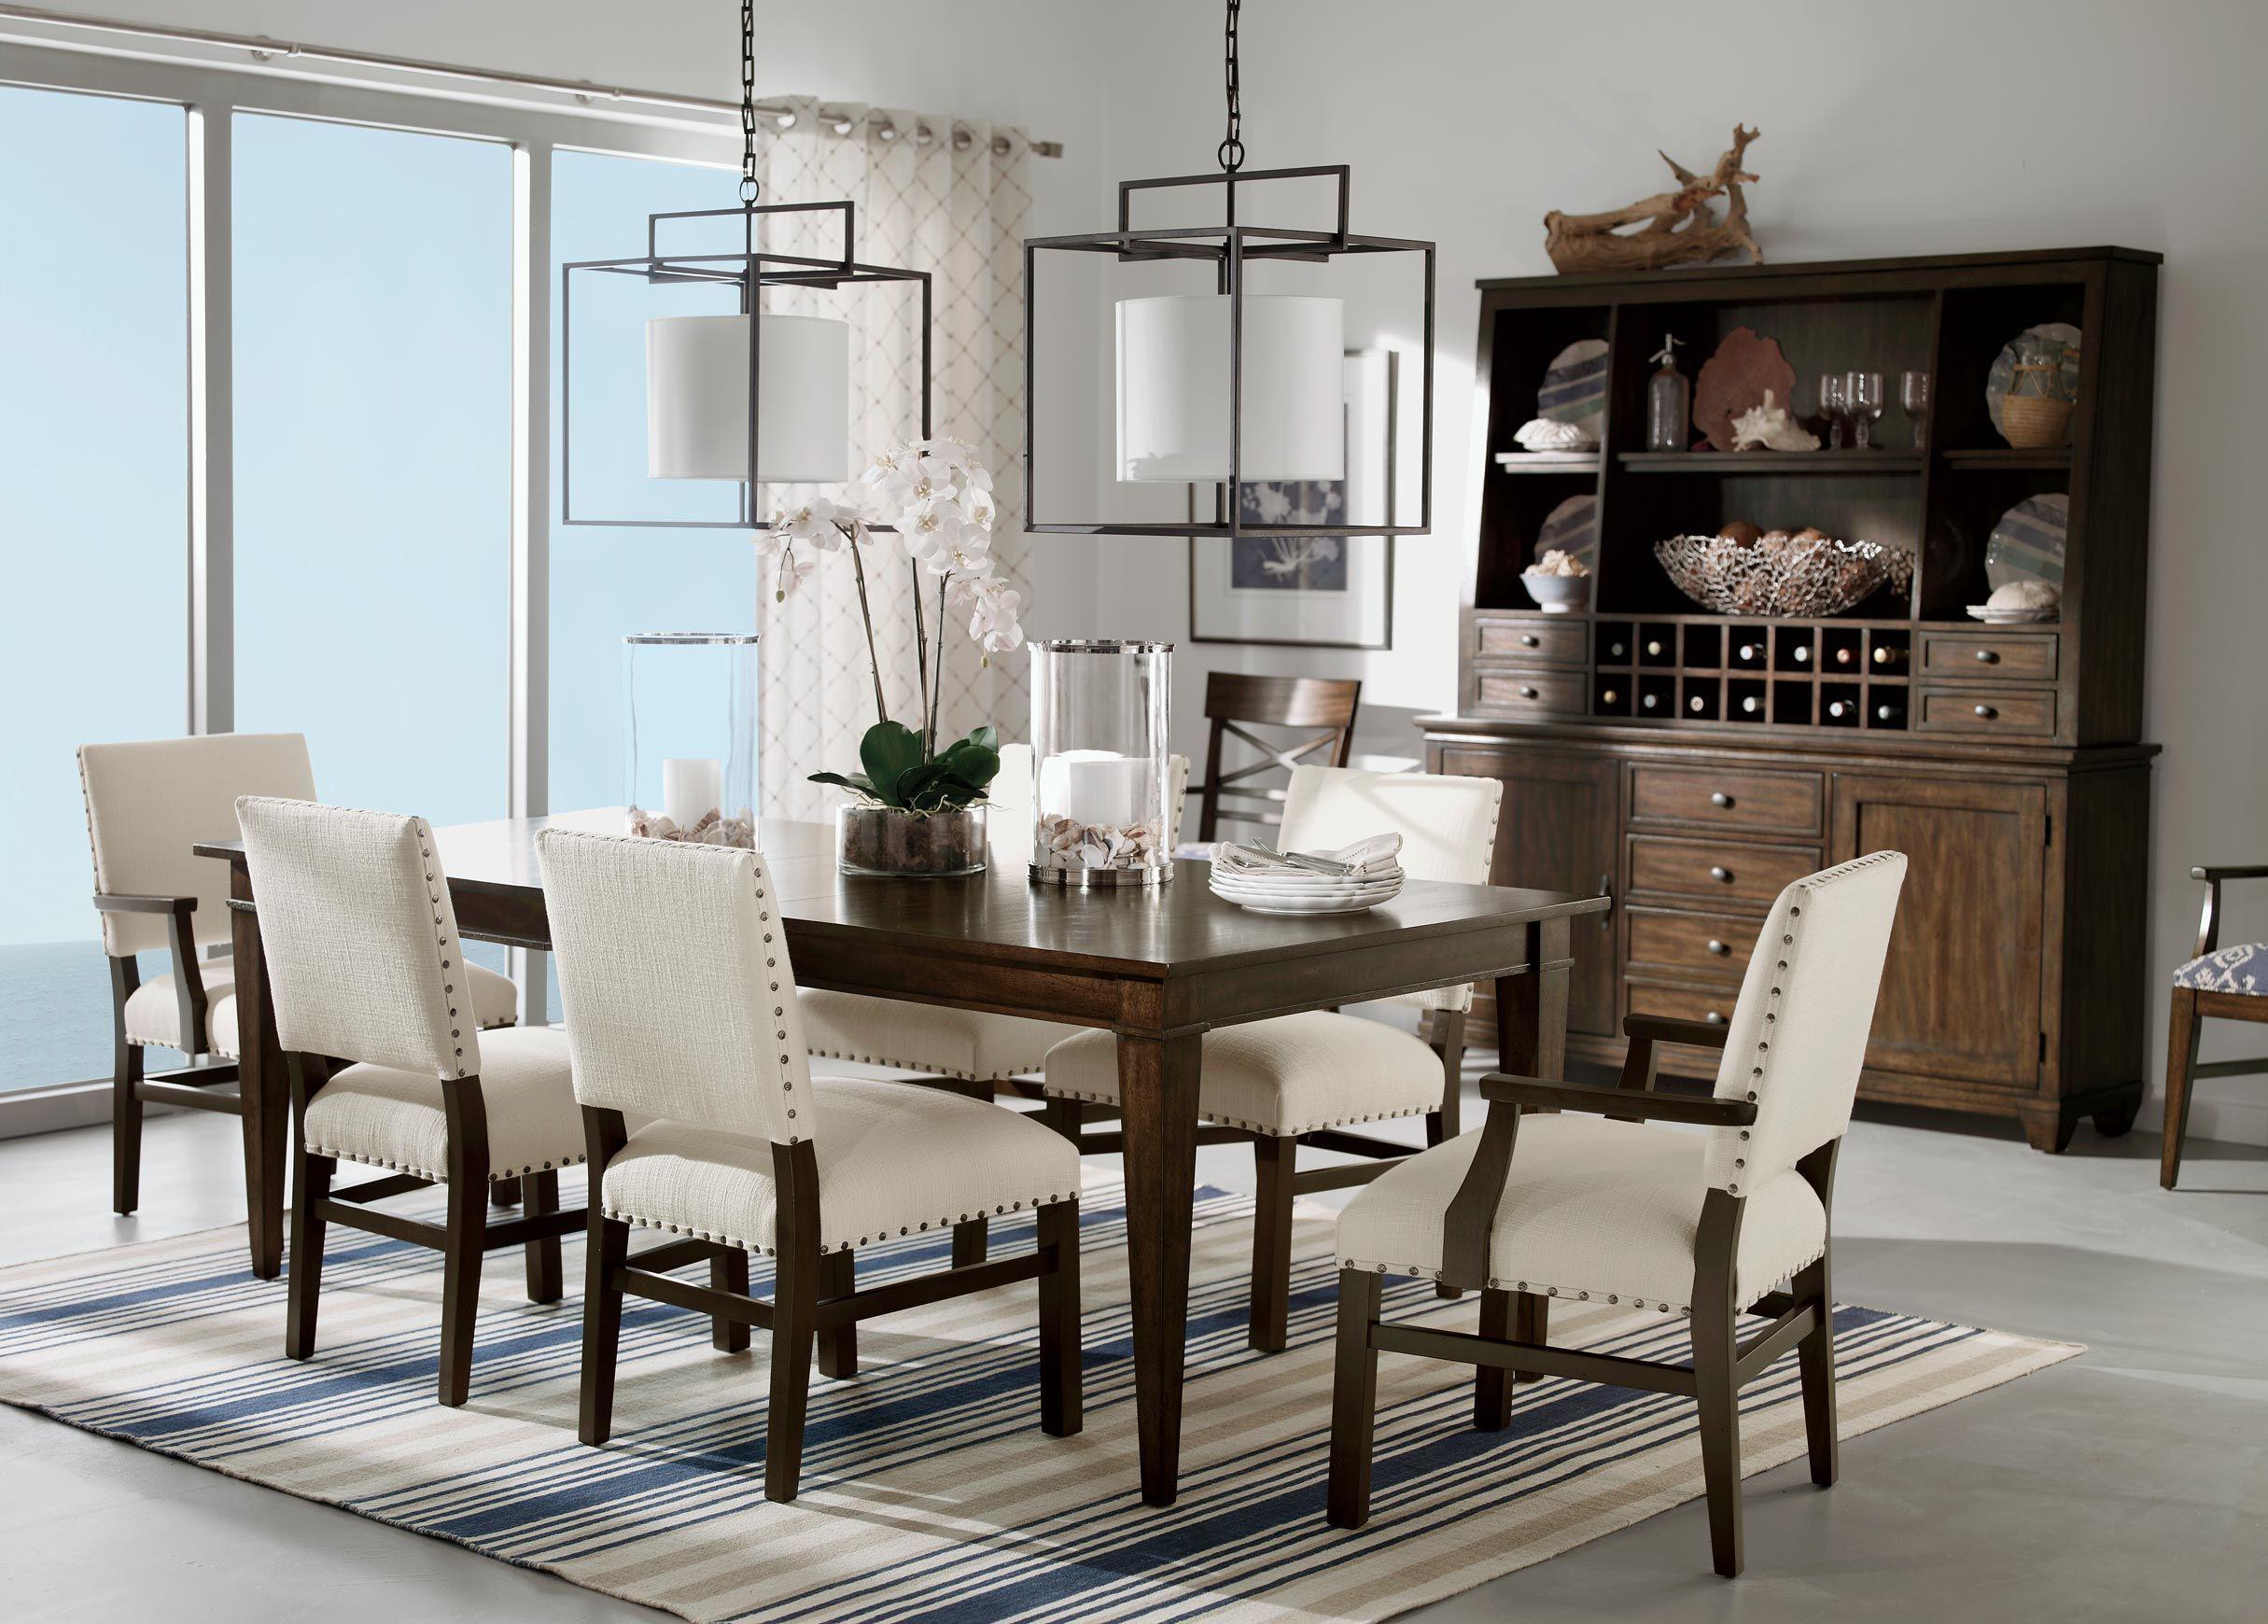 christopher dining table ethan allen dinning breakfast room rh pinterest com au